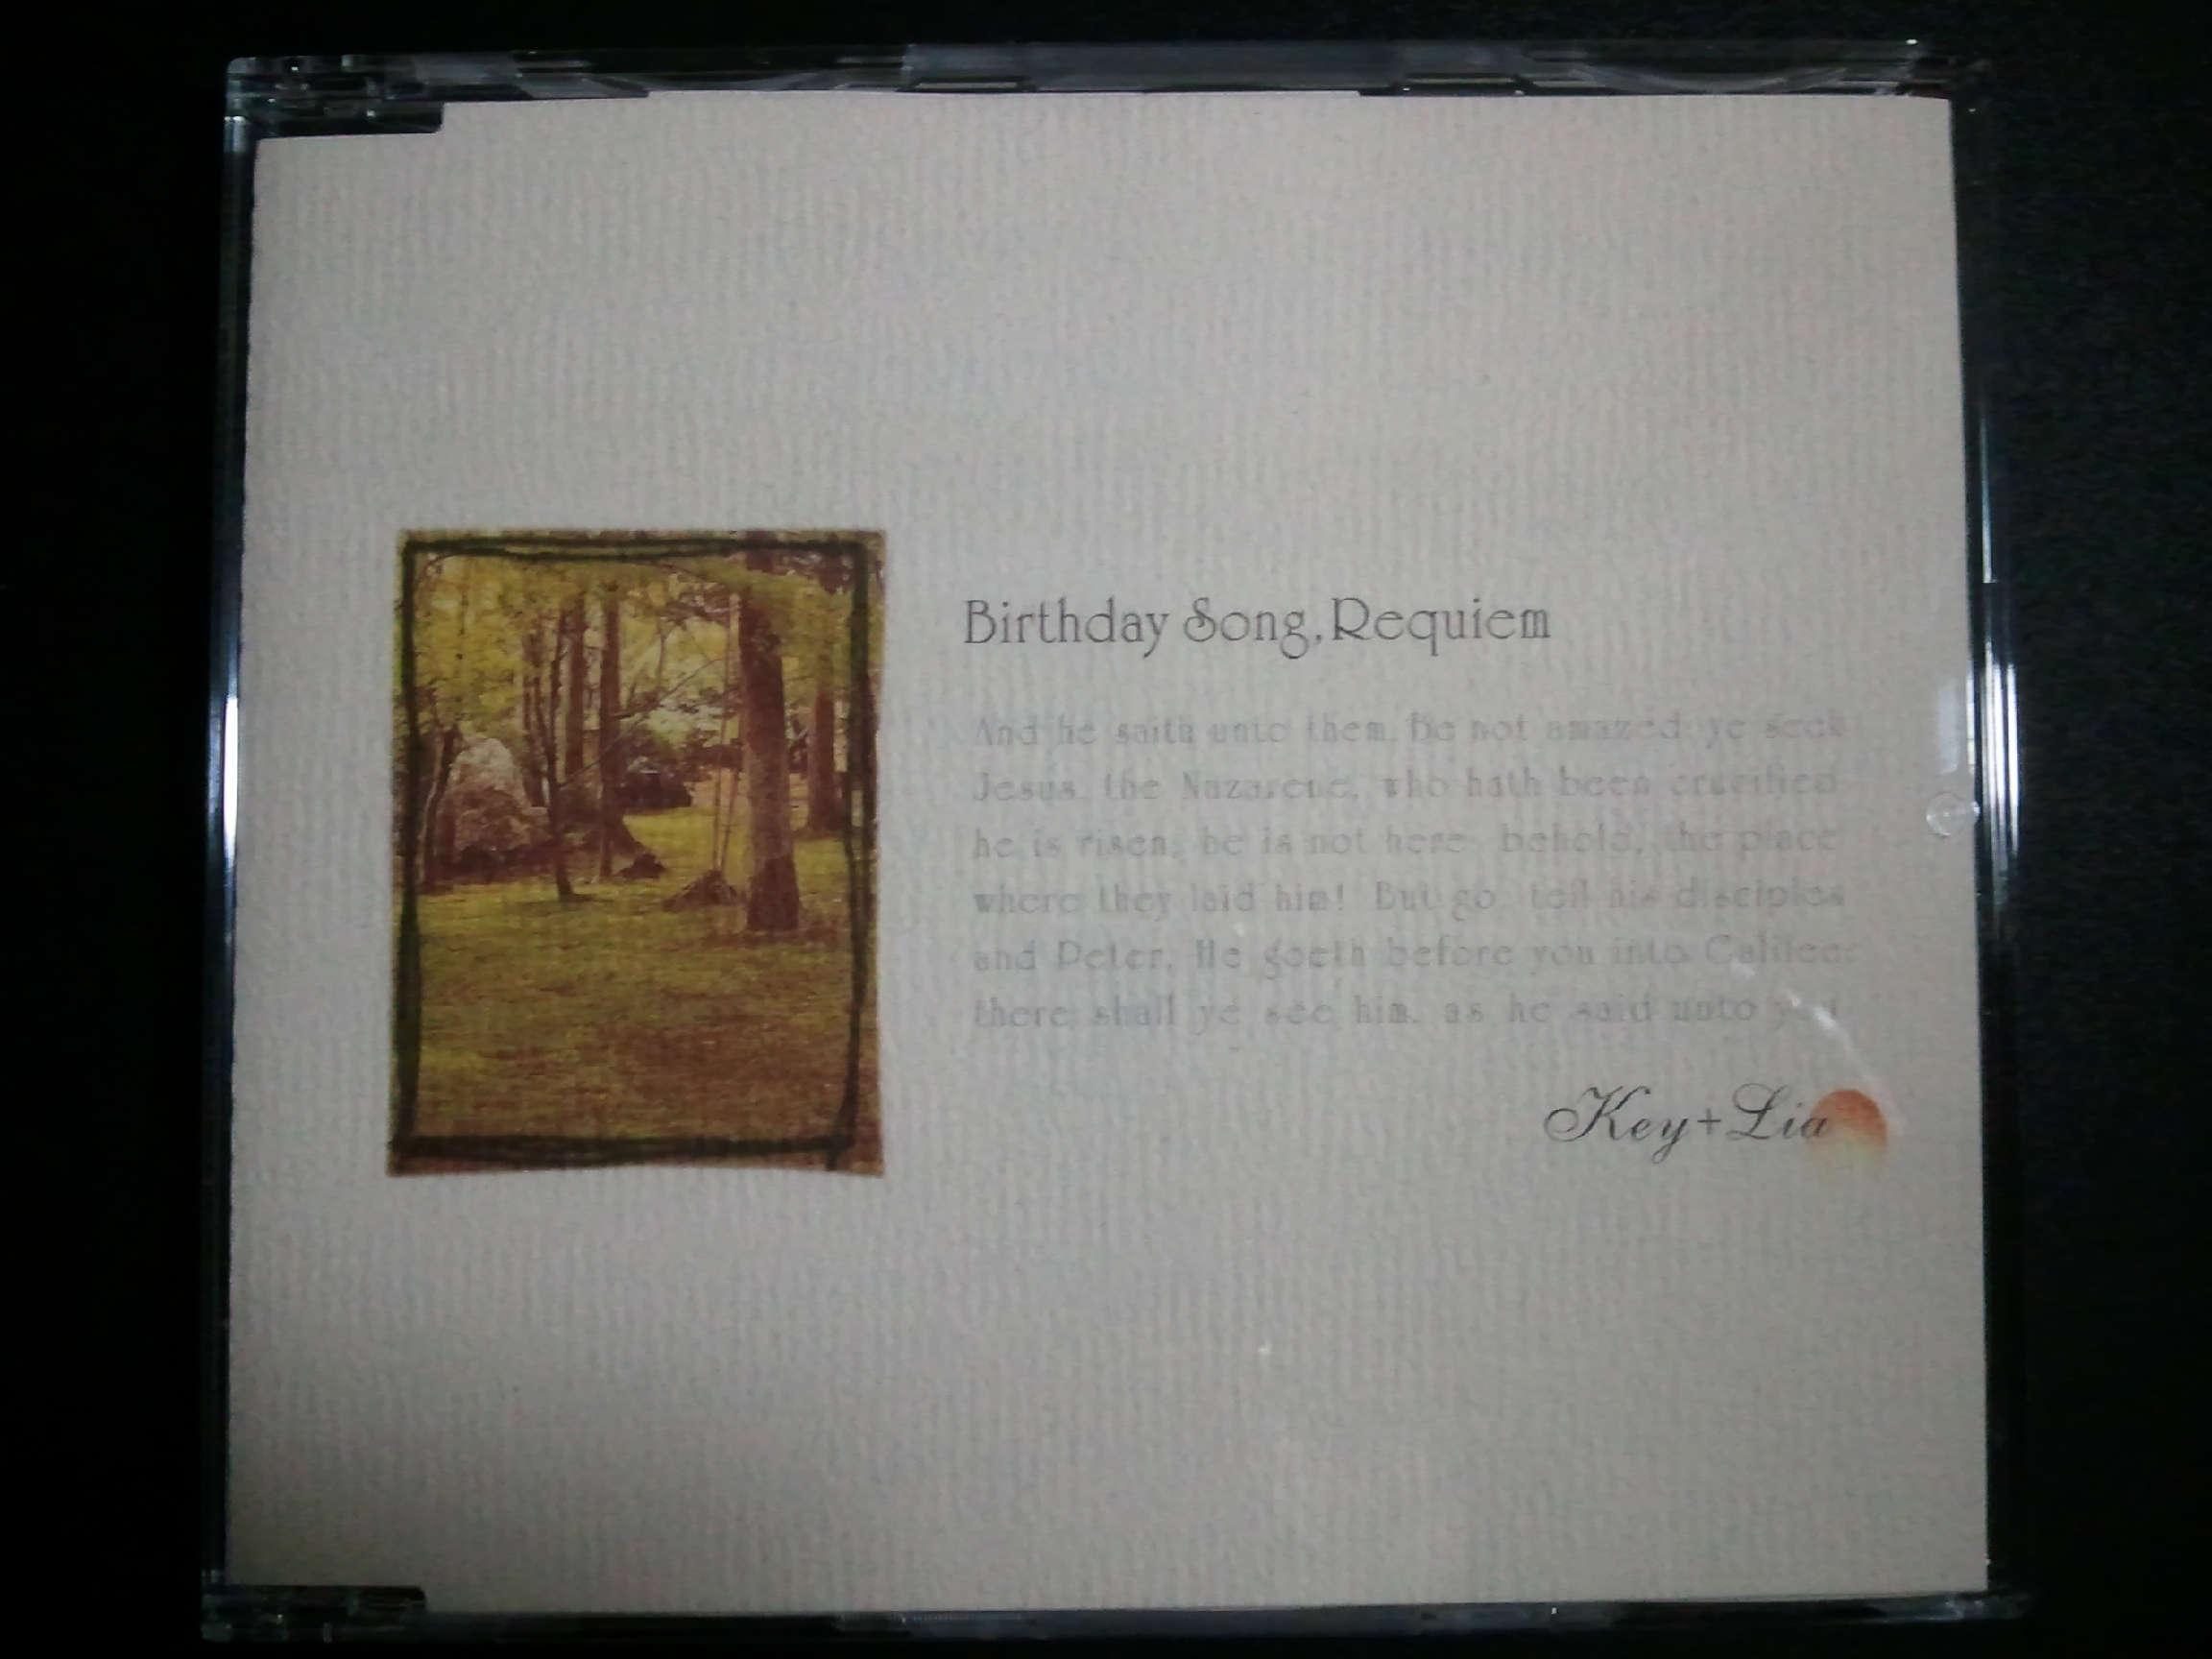 Key + Lia Birthday Song Requiem